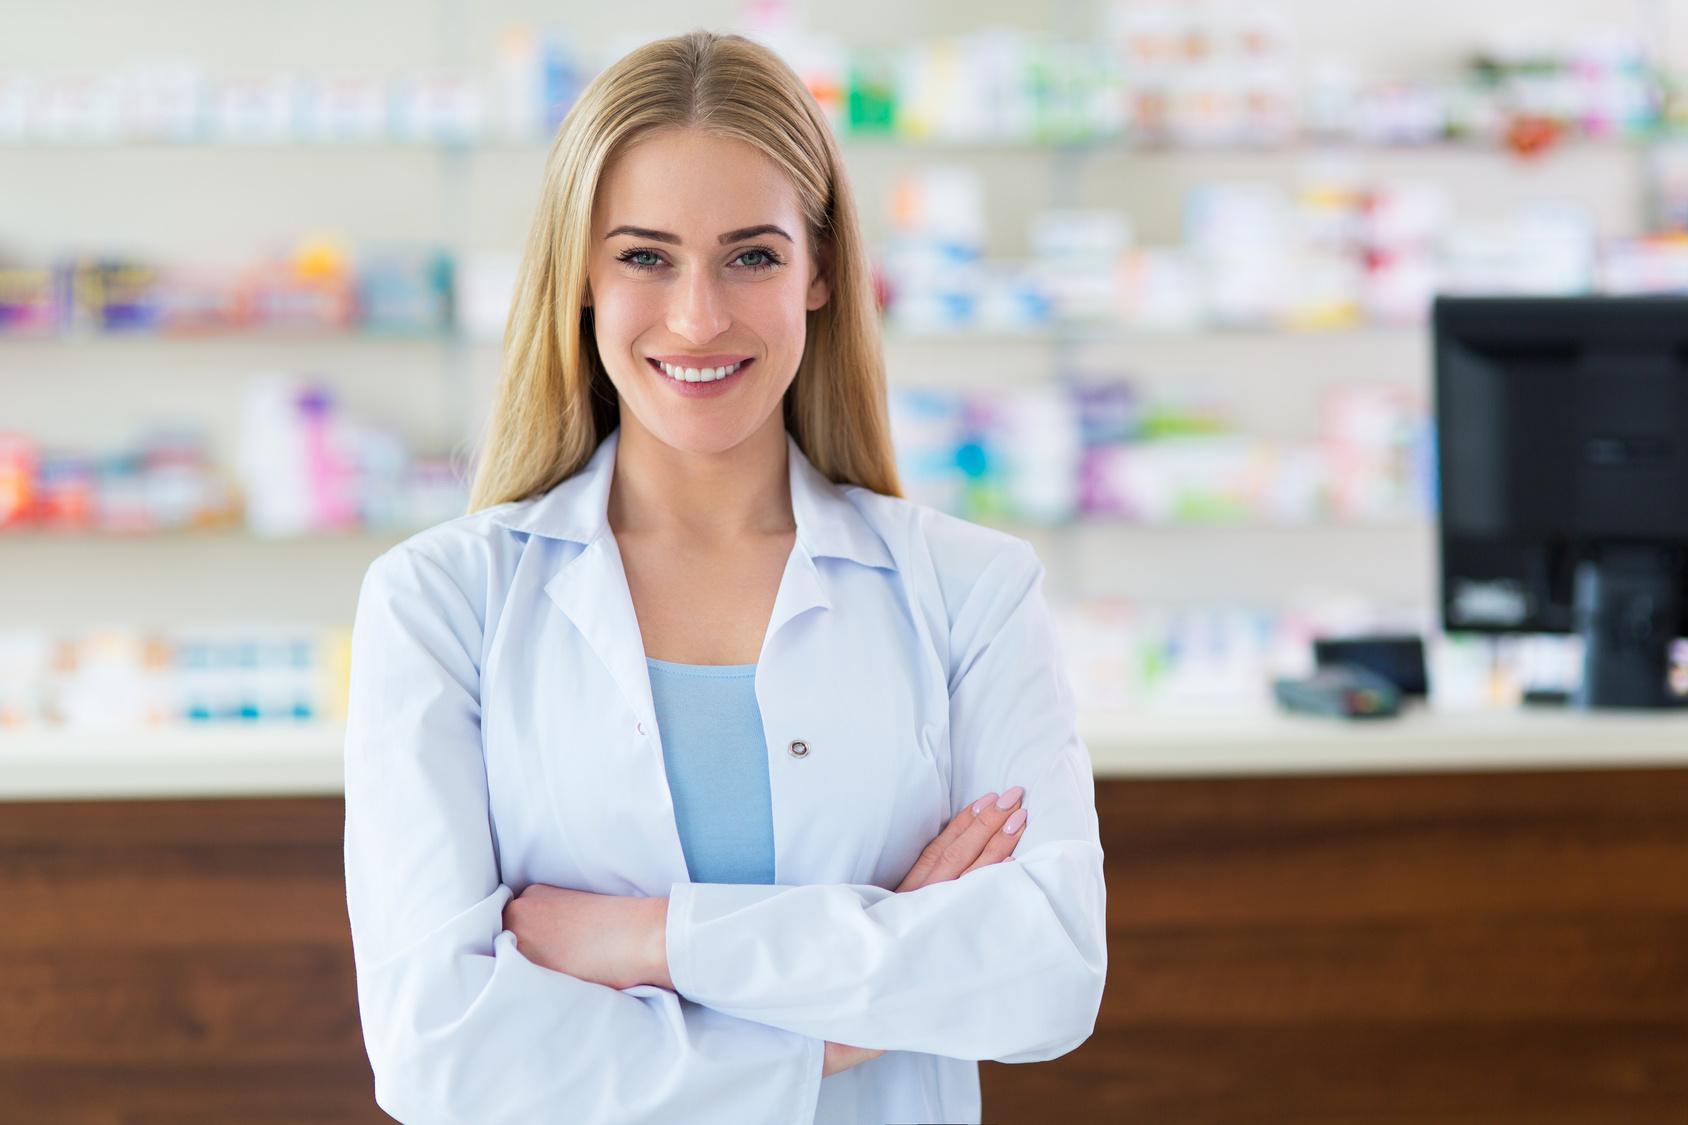 la farmacia come impresa